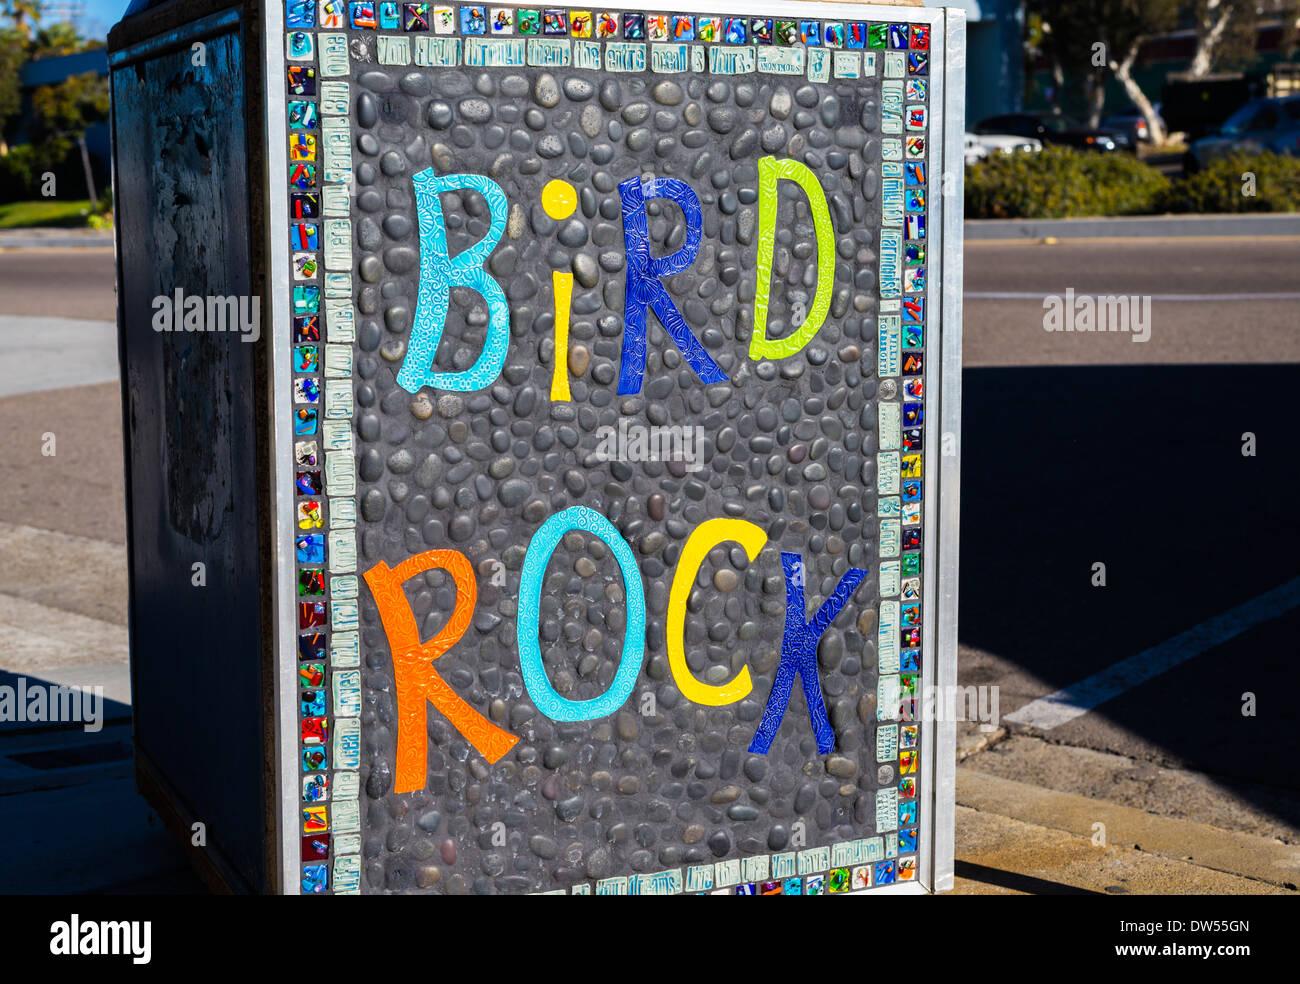 Bird Rock sign on a trash can.  La Jolla, California, United States. - Stock Image